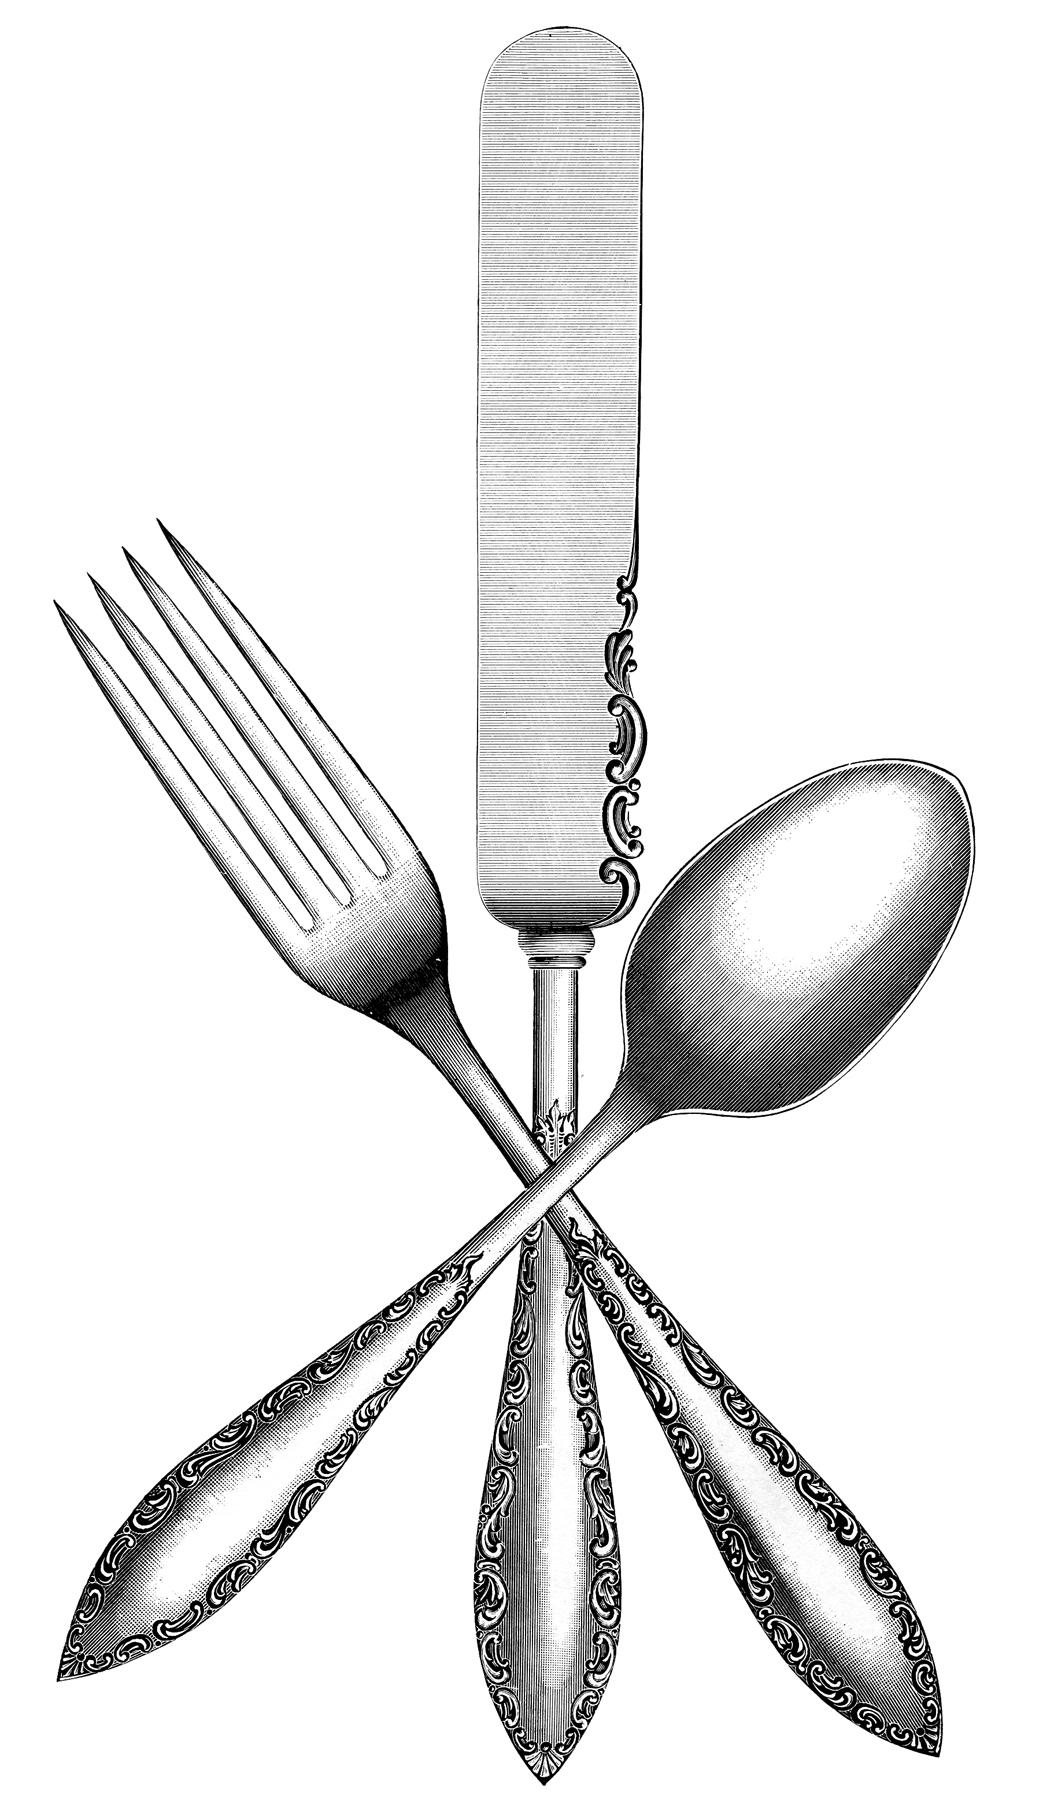 Vintage Silverware Image The Graphics Fairy